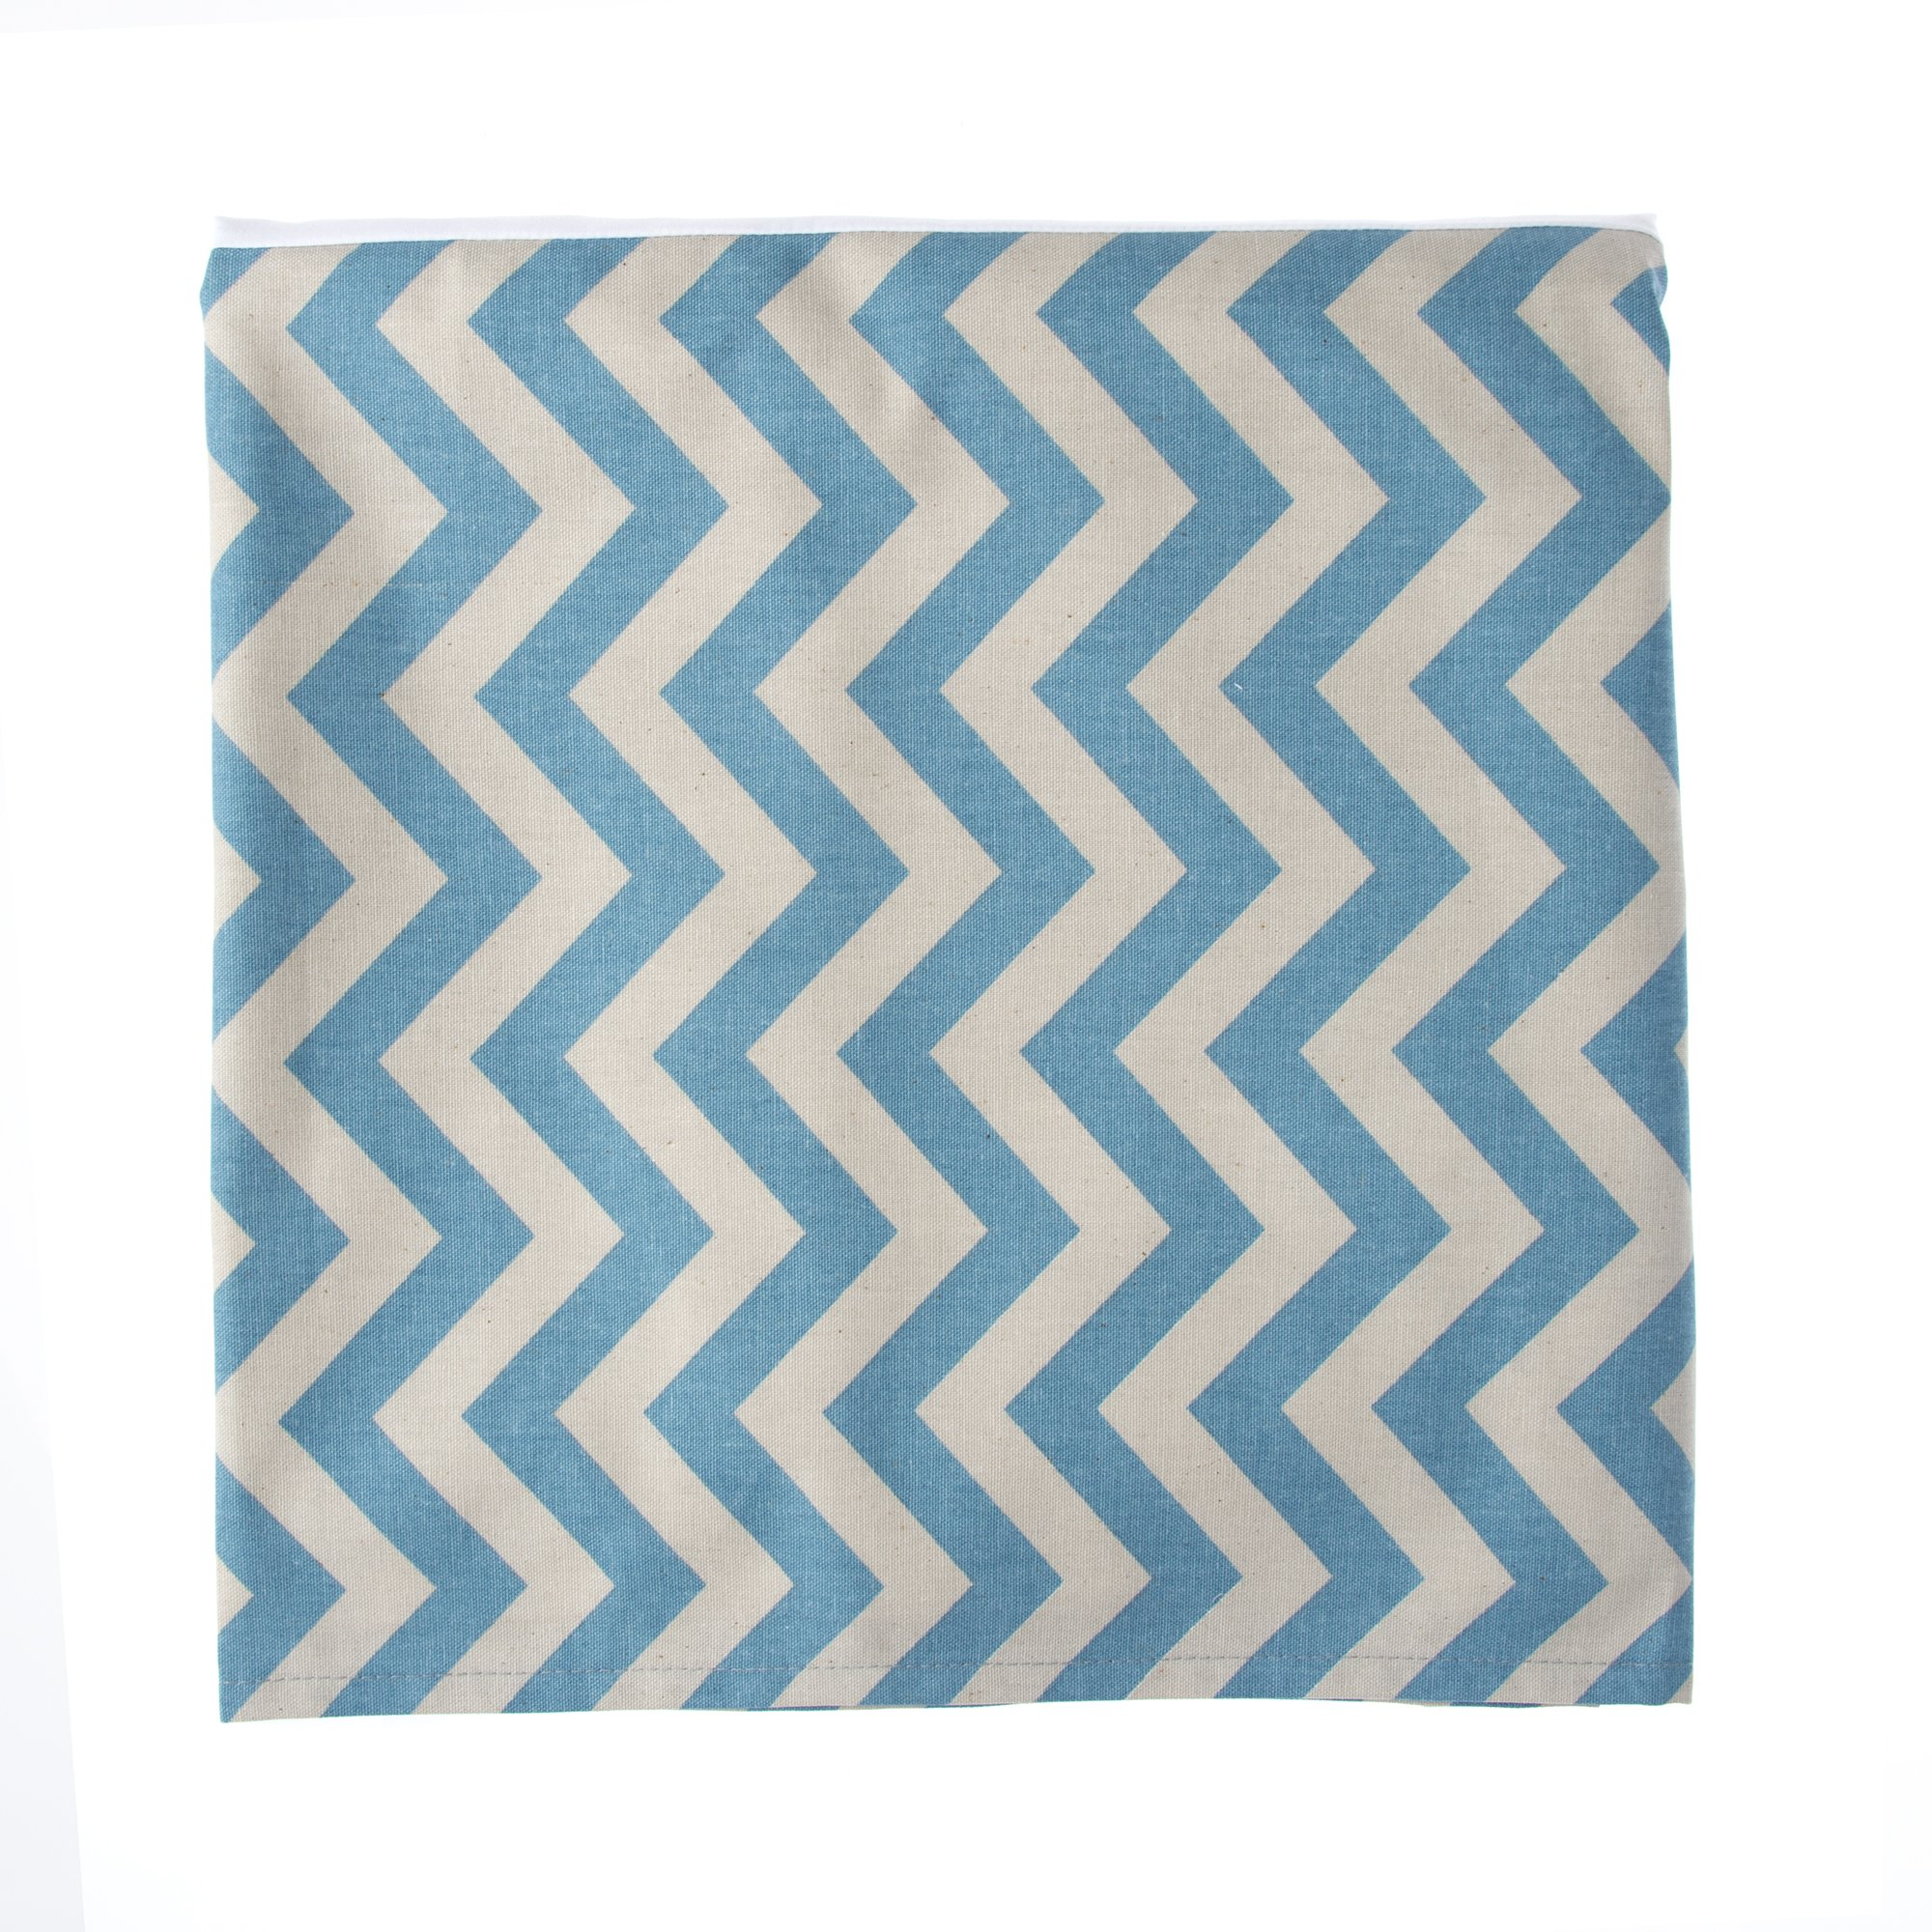 Glenna Jean North Country Full Skirt, Blue/Grey Chevron